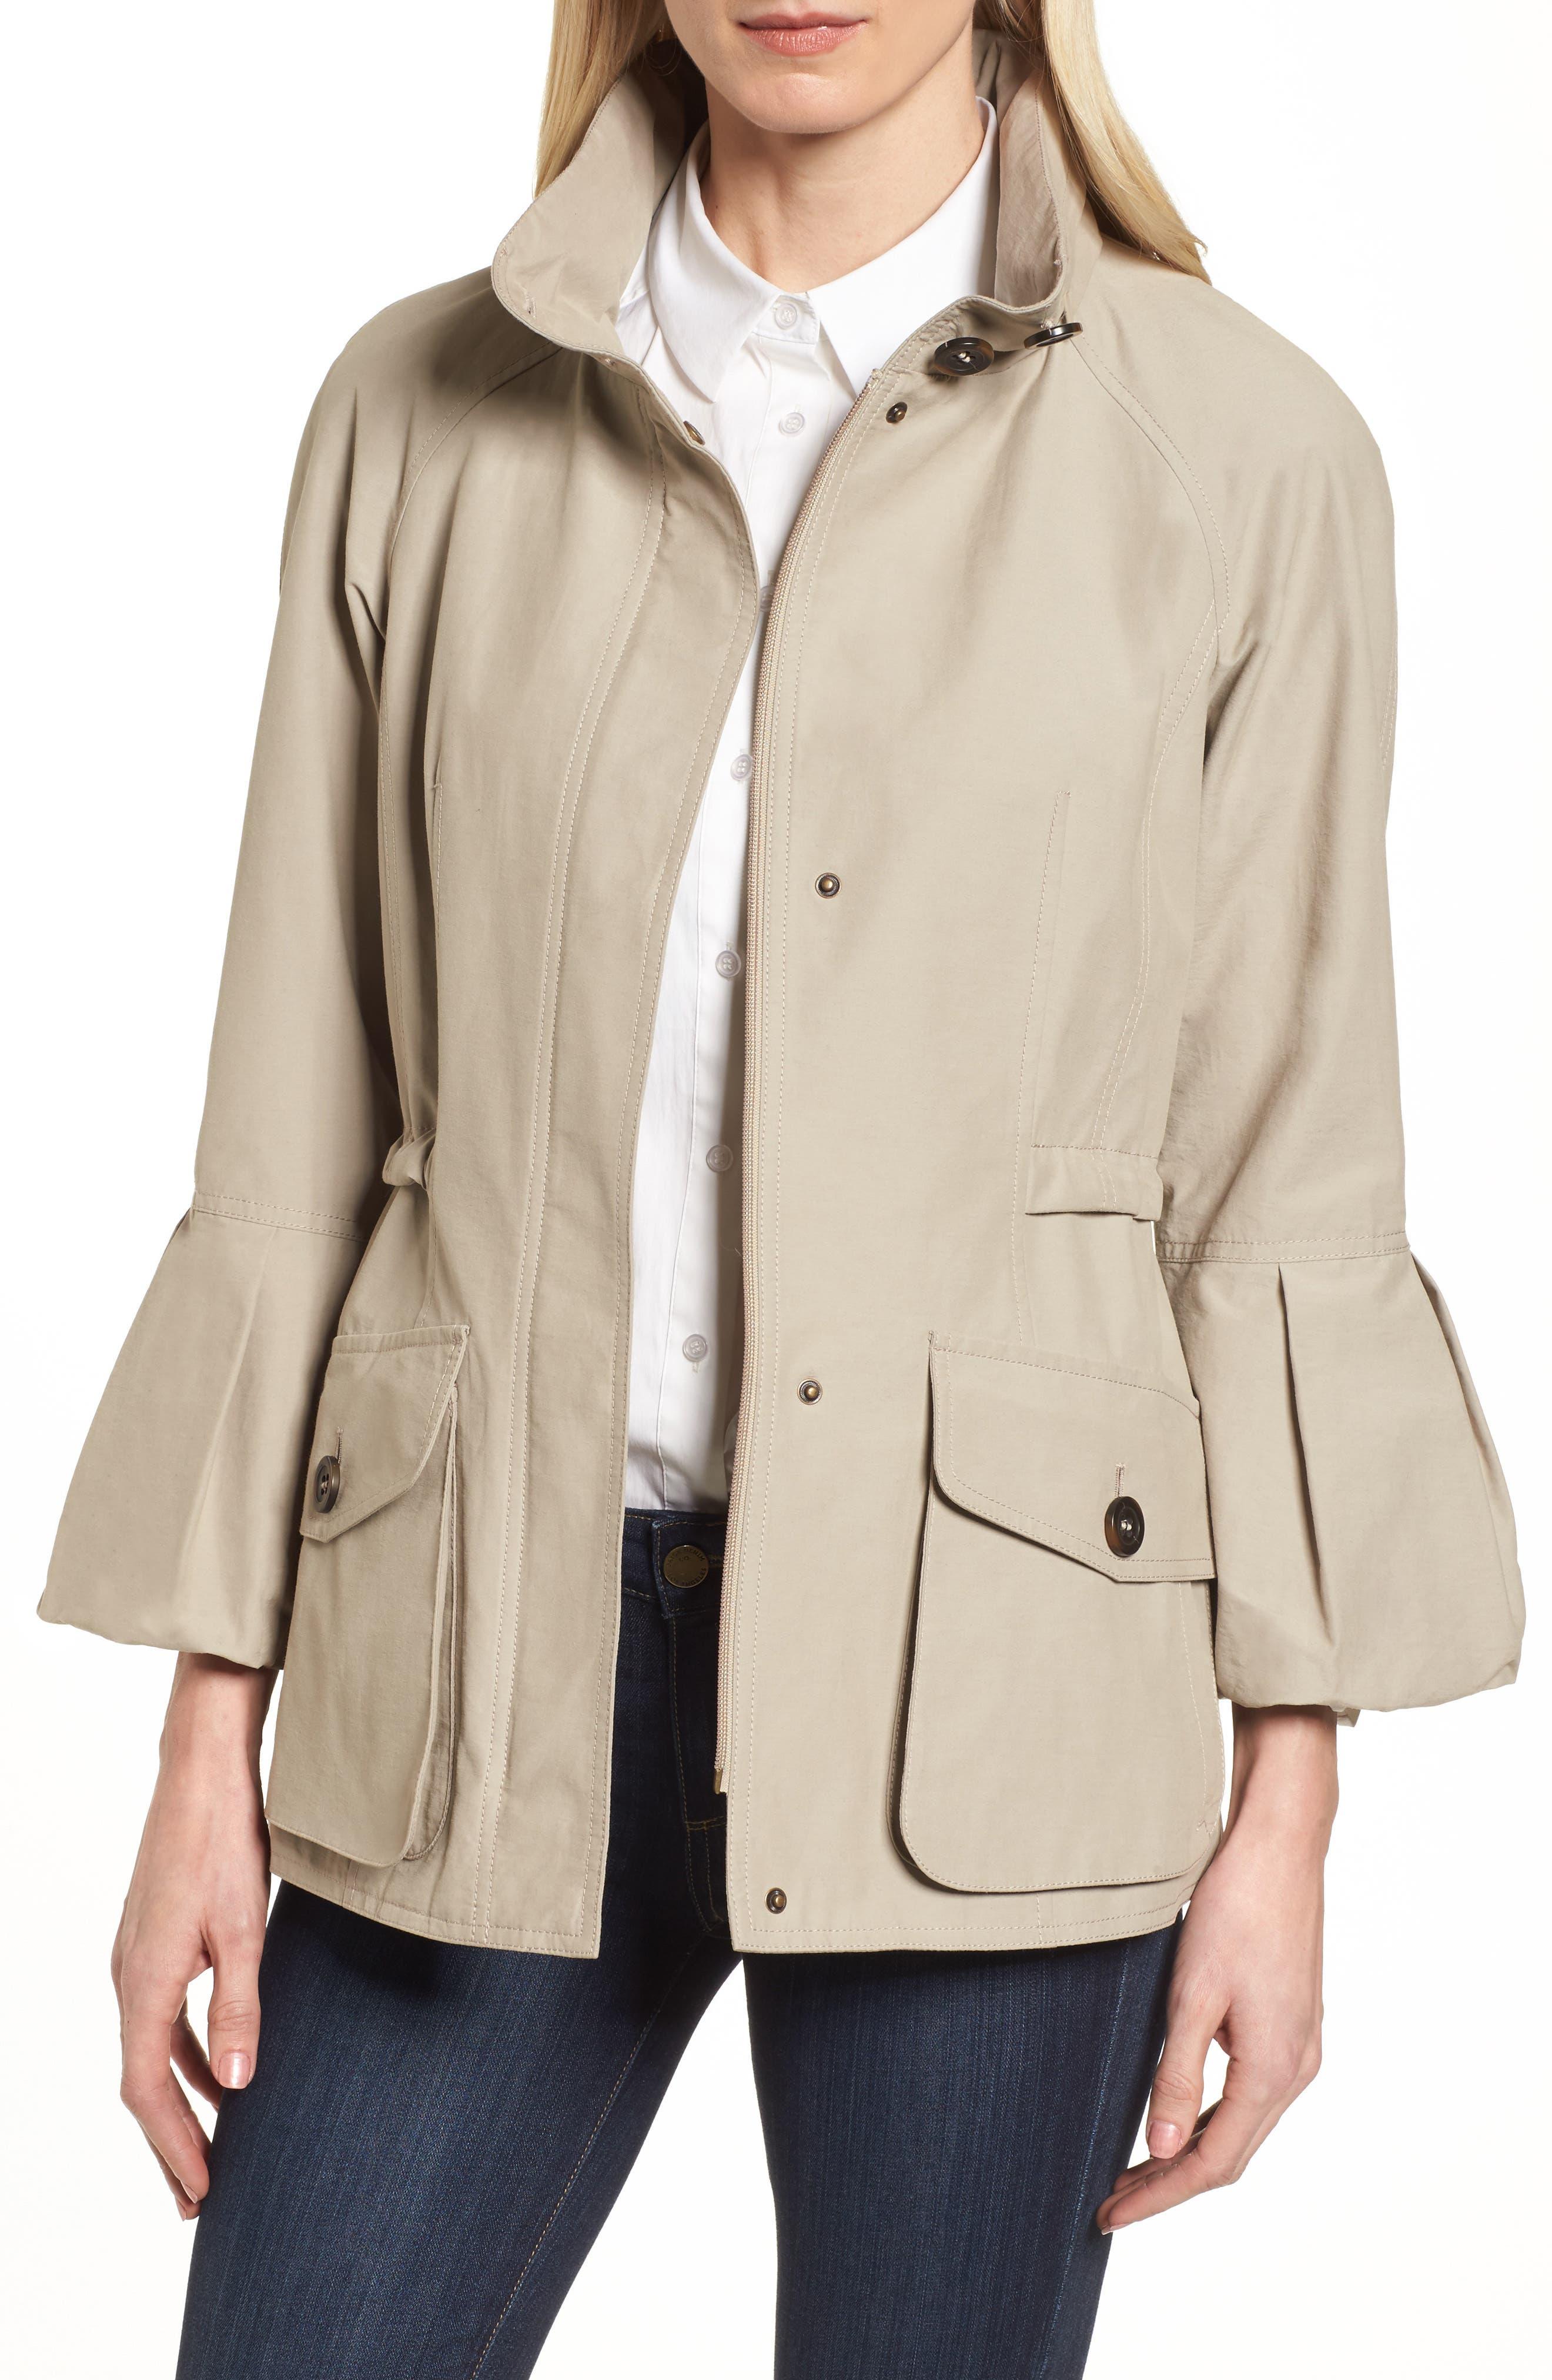 Main Image - Gallery Bell Sleeve Jacket with Stowaway Hood